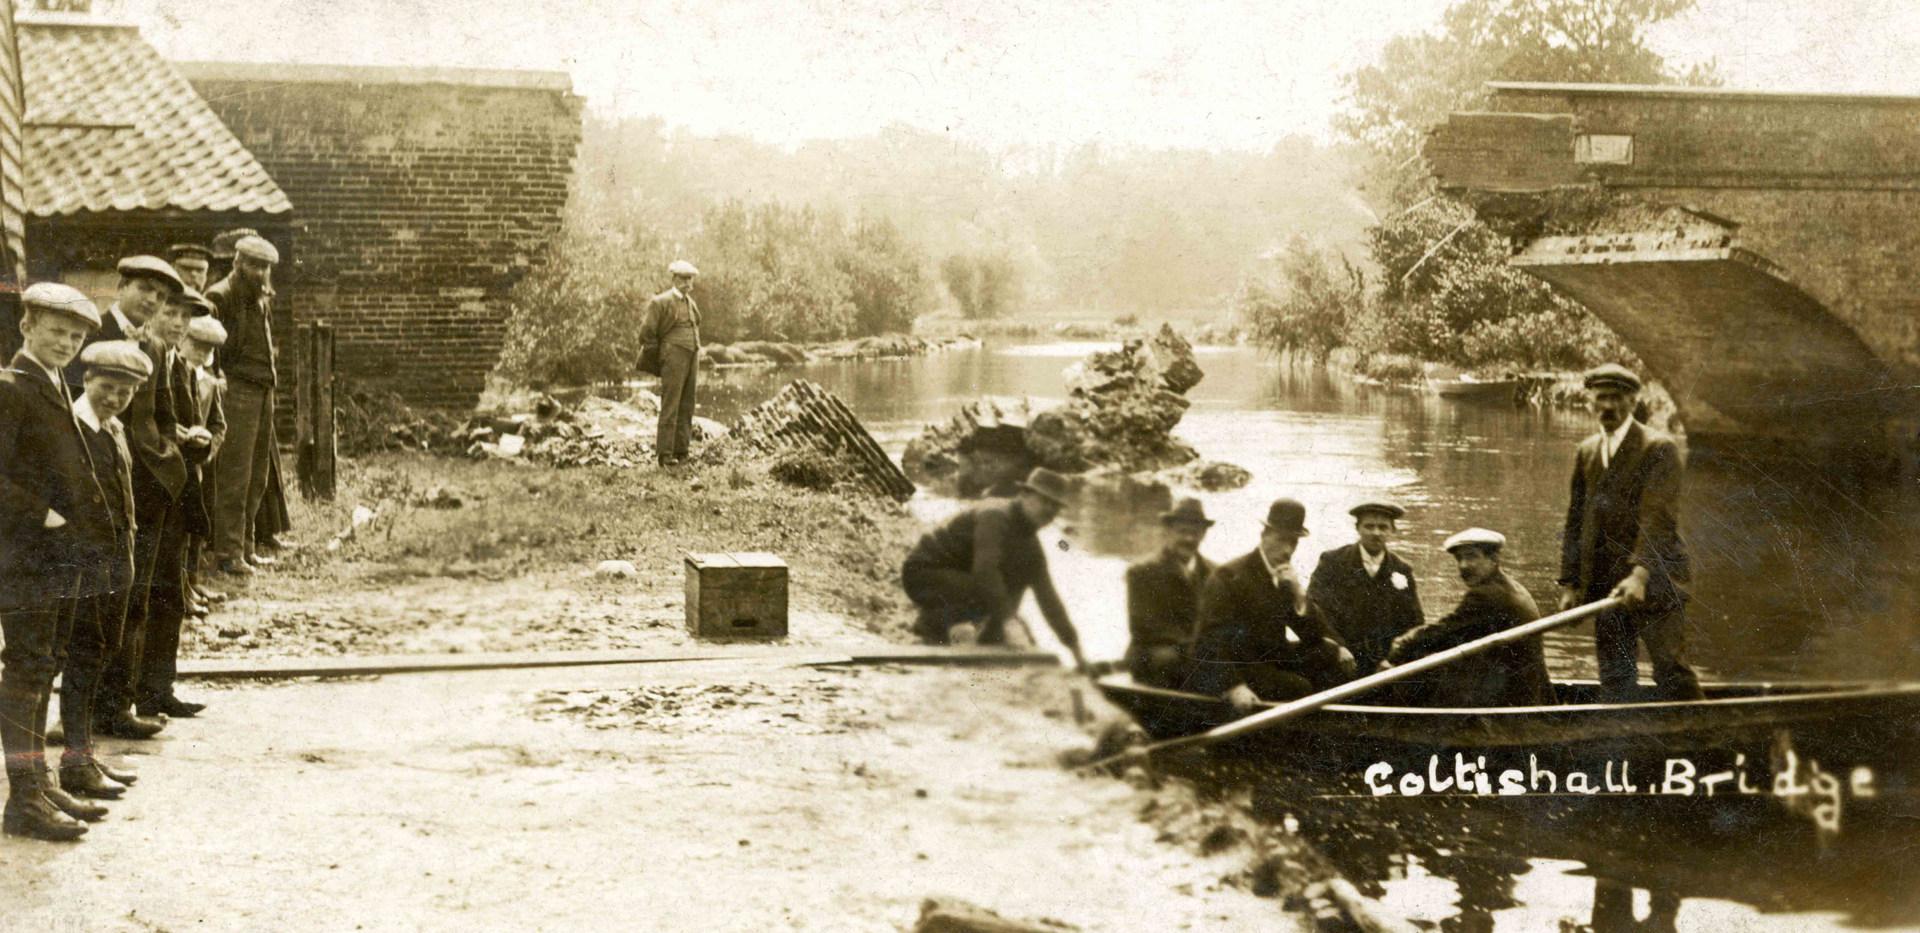 A Damaged Coltishall Bridge after the 1912 flood